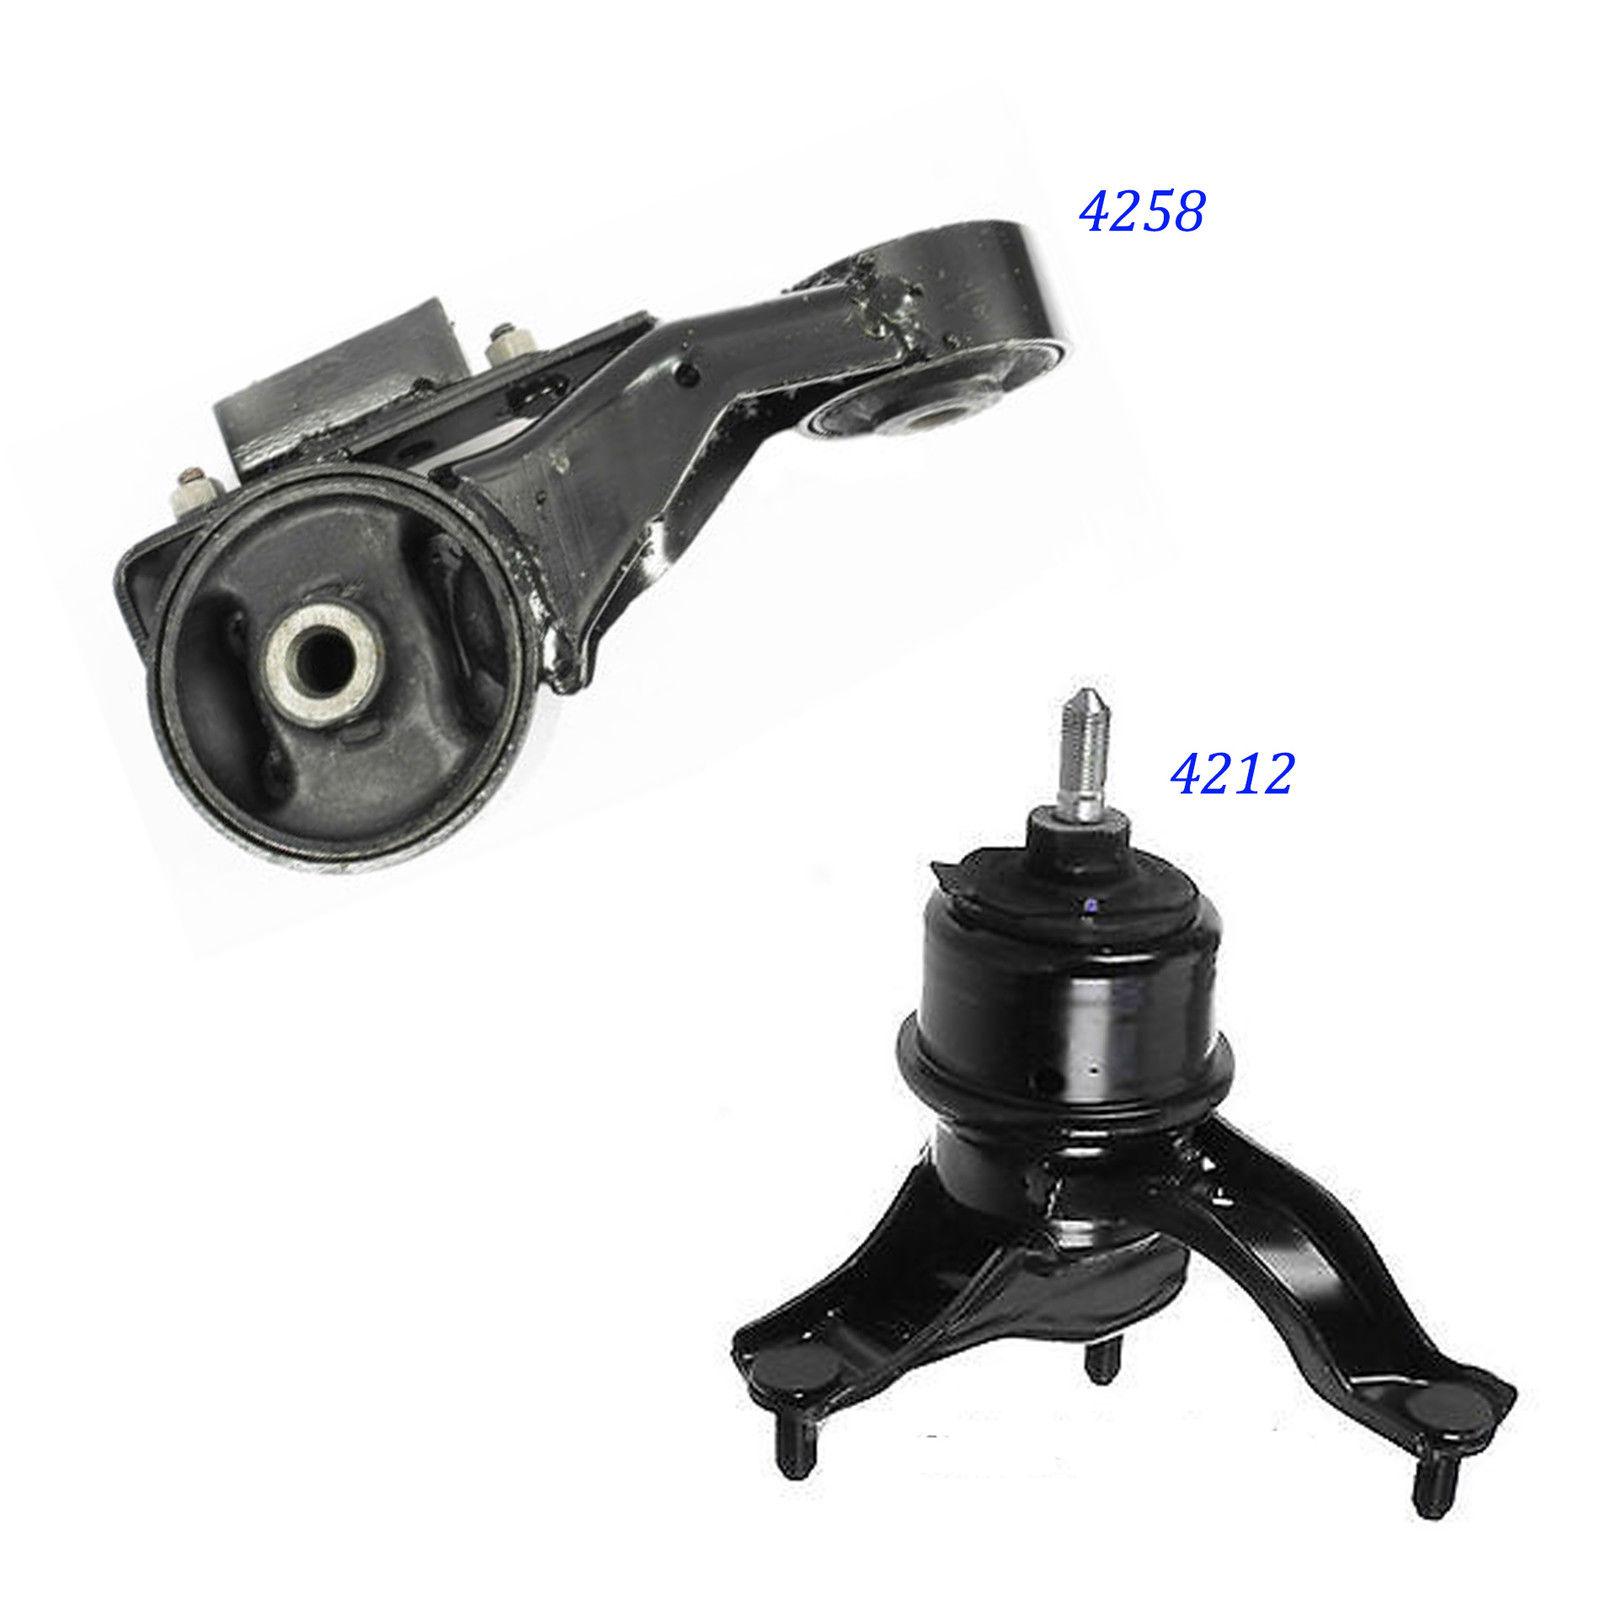 Torque Strut Front Engine Motor Mount For 04 05 06 Toyota Sienna 3.3 4WD 4258